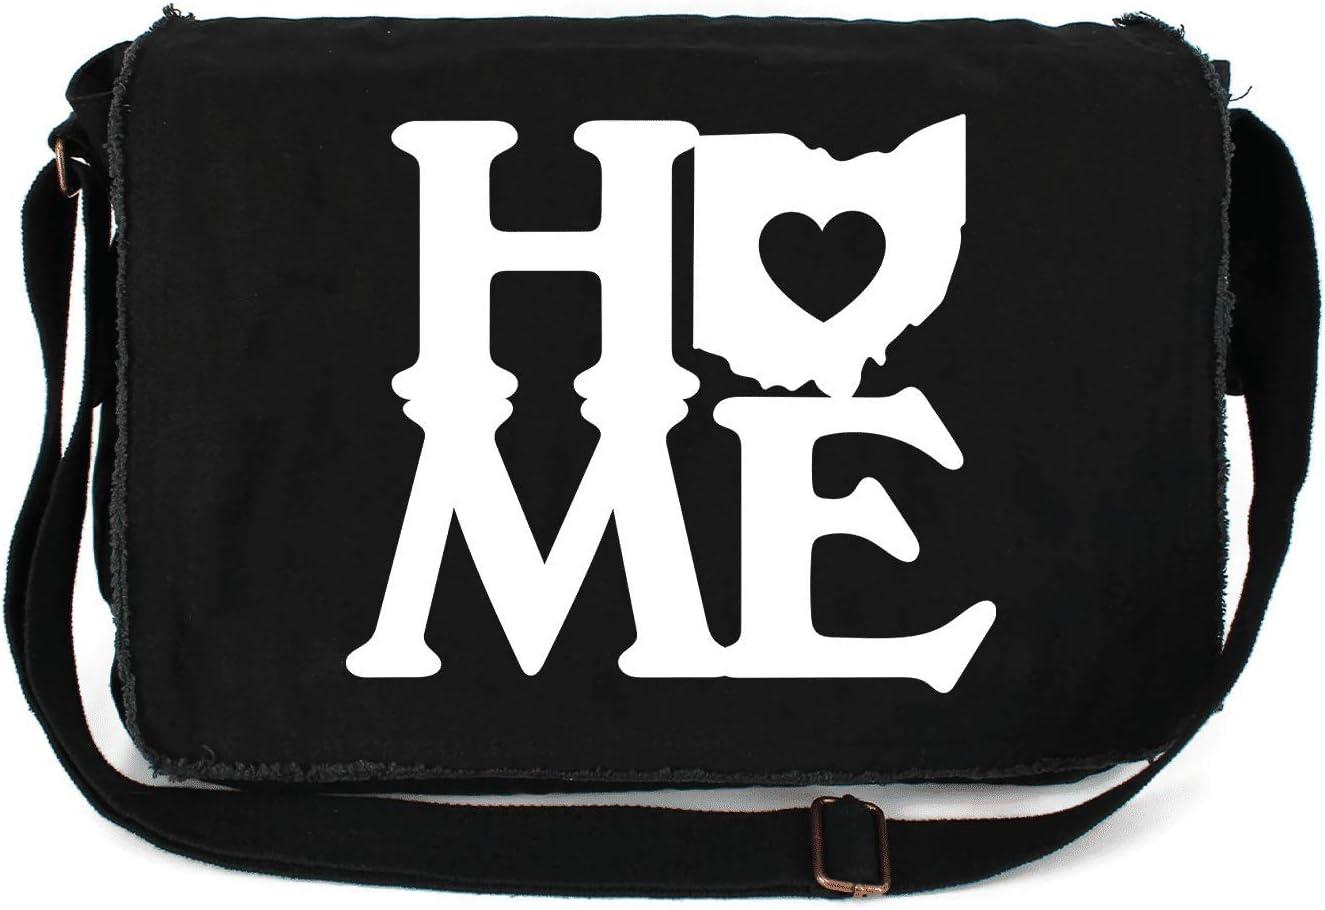 HARD EDGE DESIGN Ohio Home State famous Block Raw Heart Custom Wholesale Printed